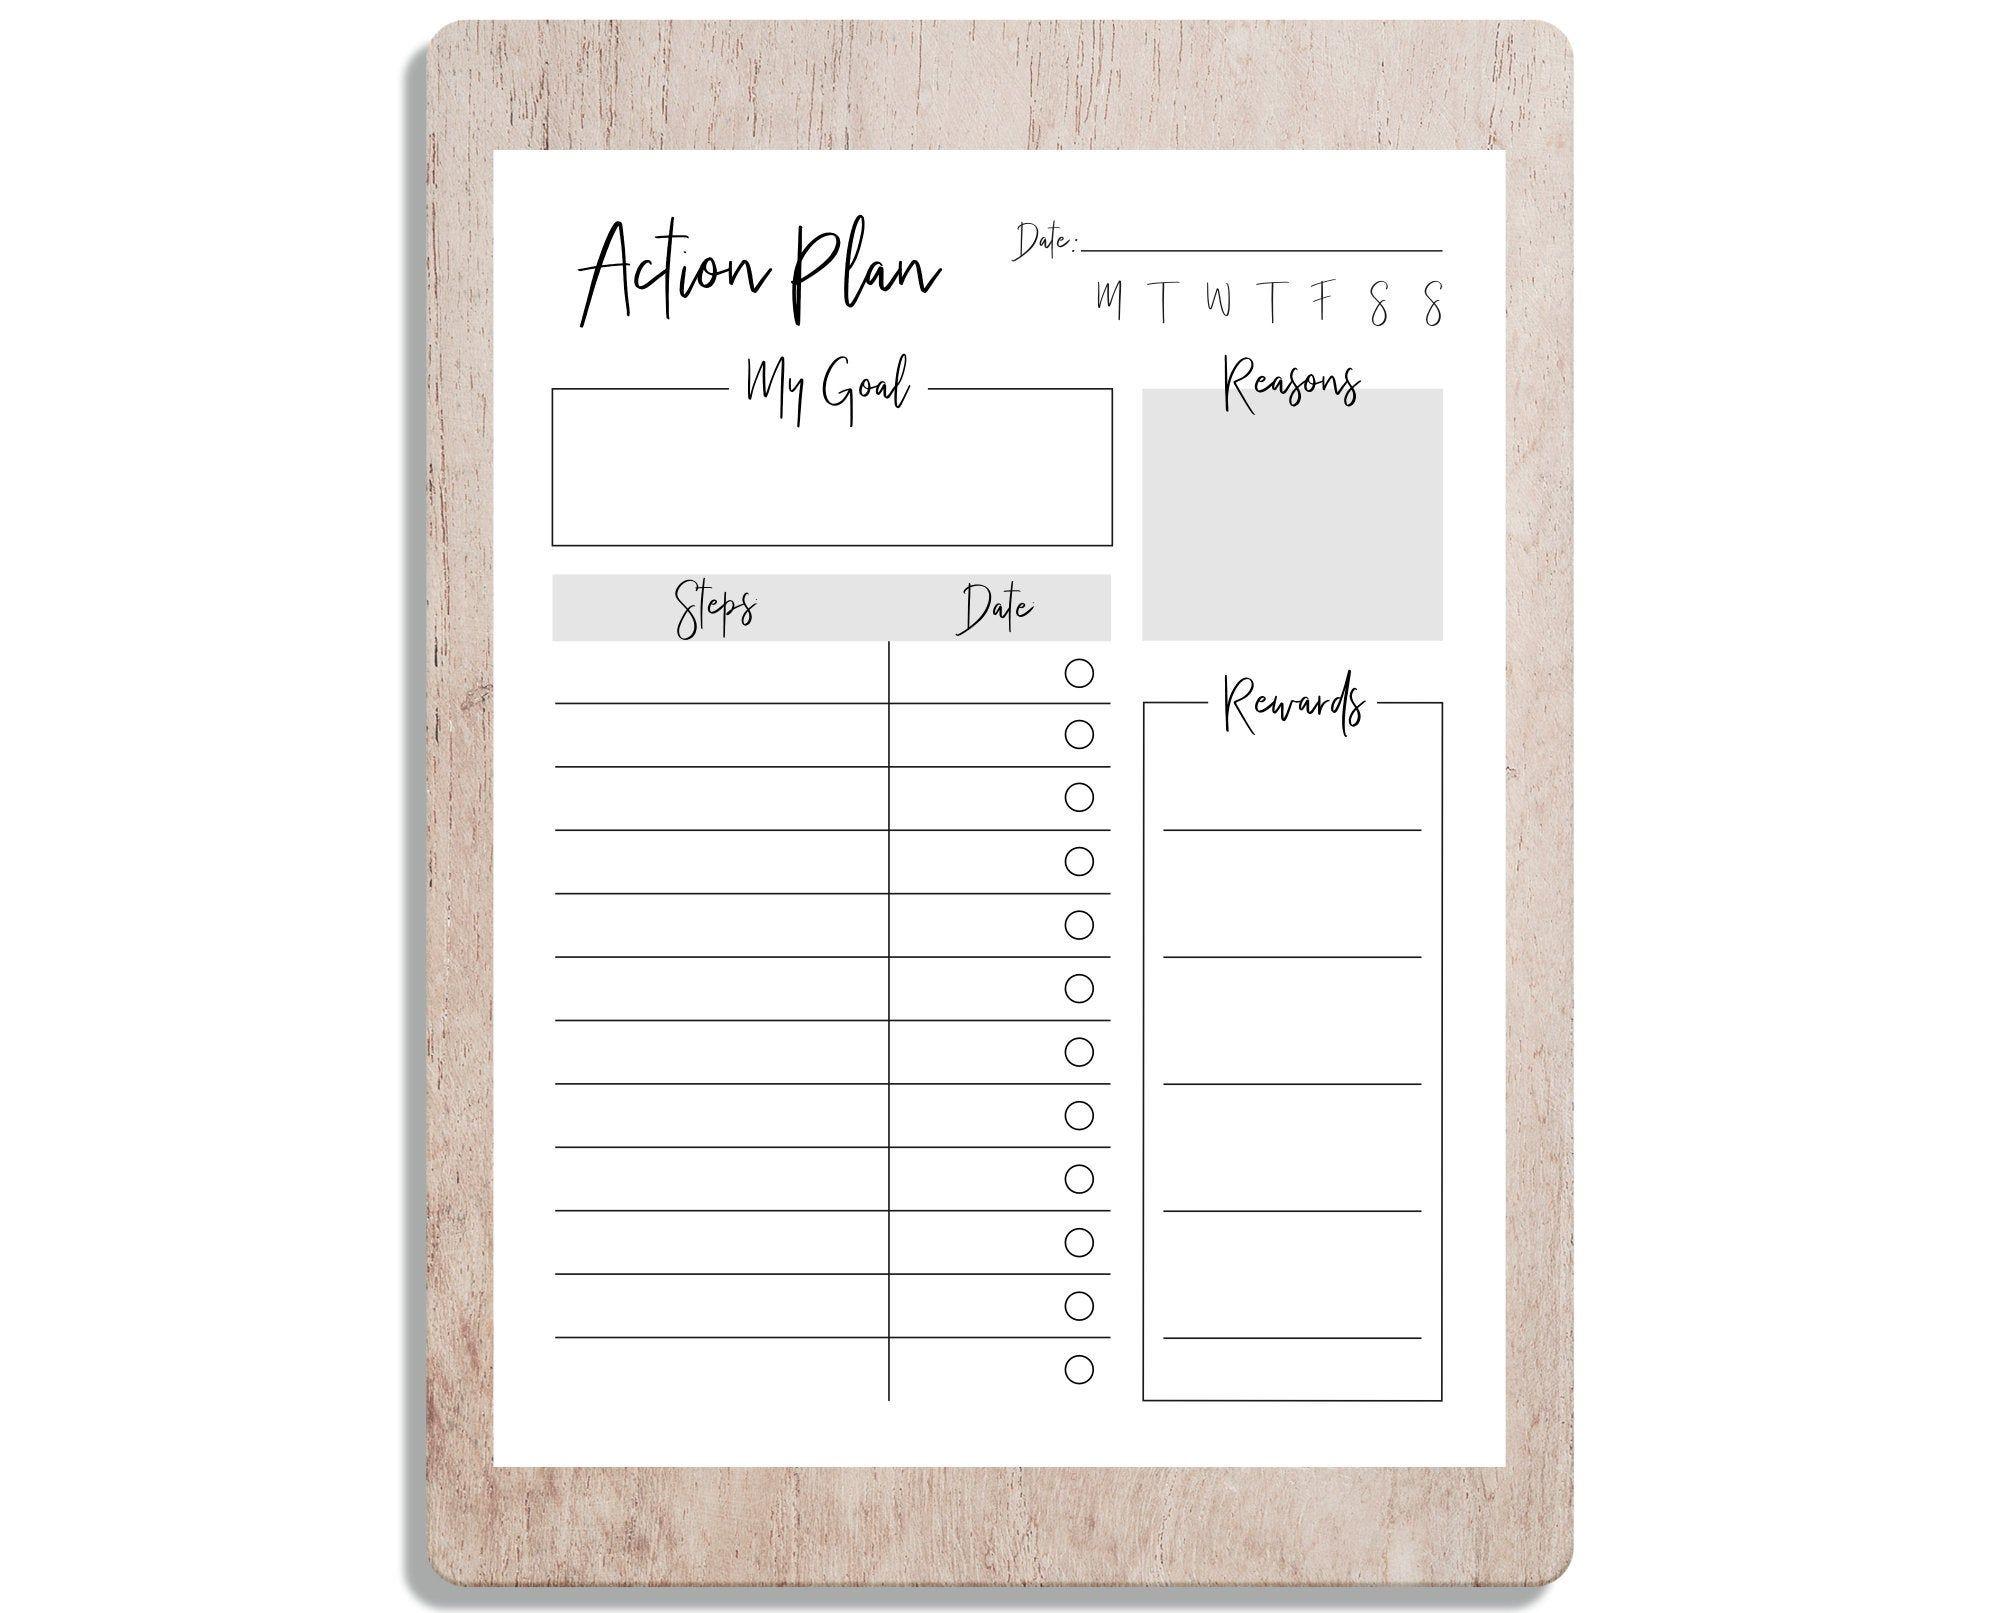 Printable Goal Action Plan